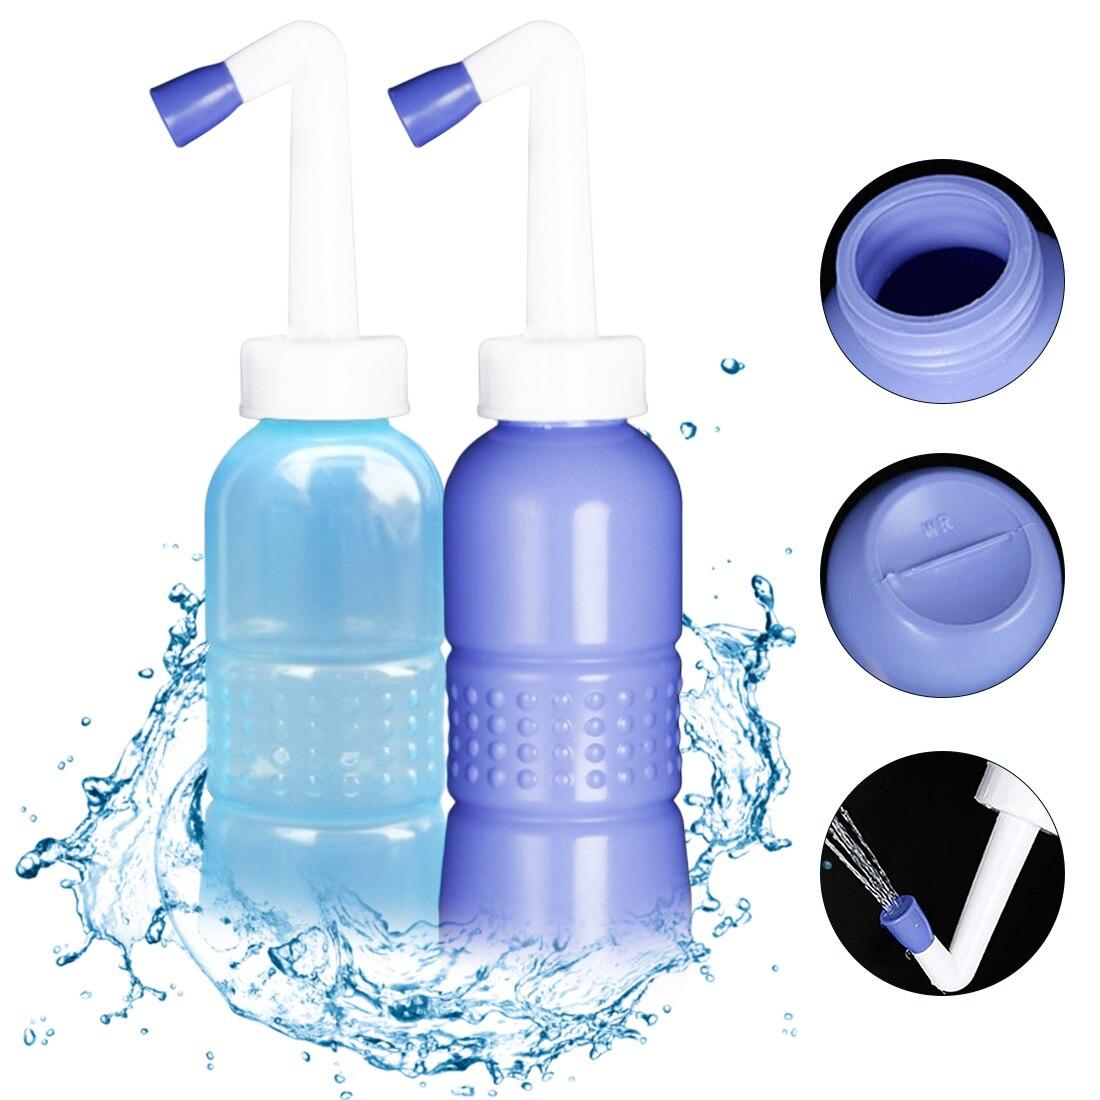 EVA Portable Sprayer 420ml/450ml/650ml  Hand Held Travel Bidet Toilet Seat Tackle  Bidet Bottle Washing Toilet Personal Cleaner